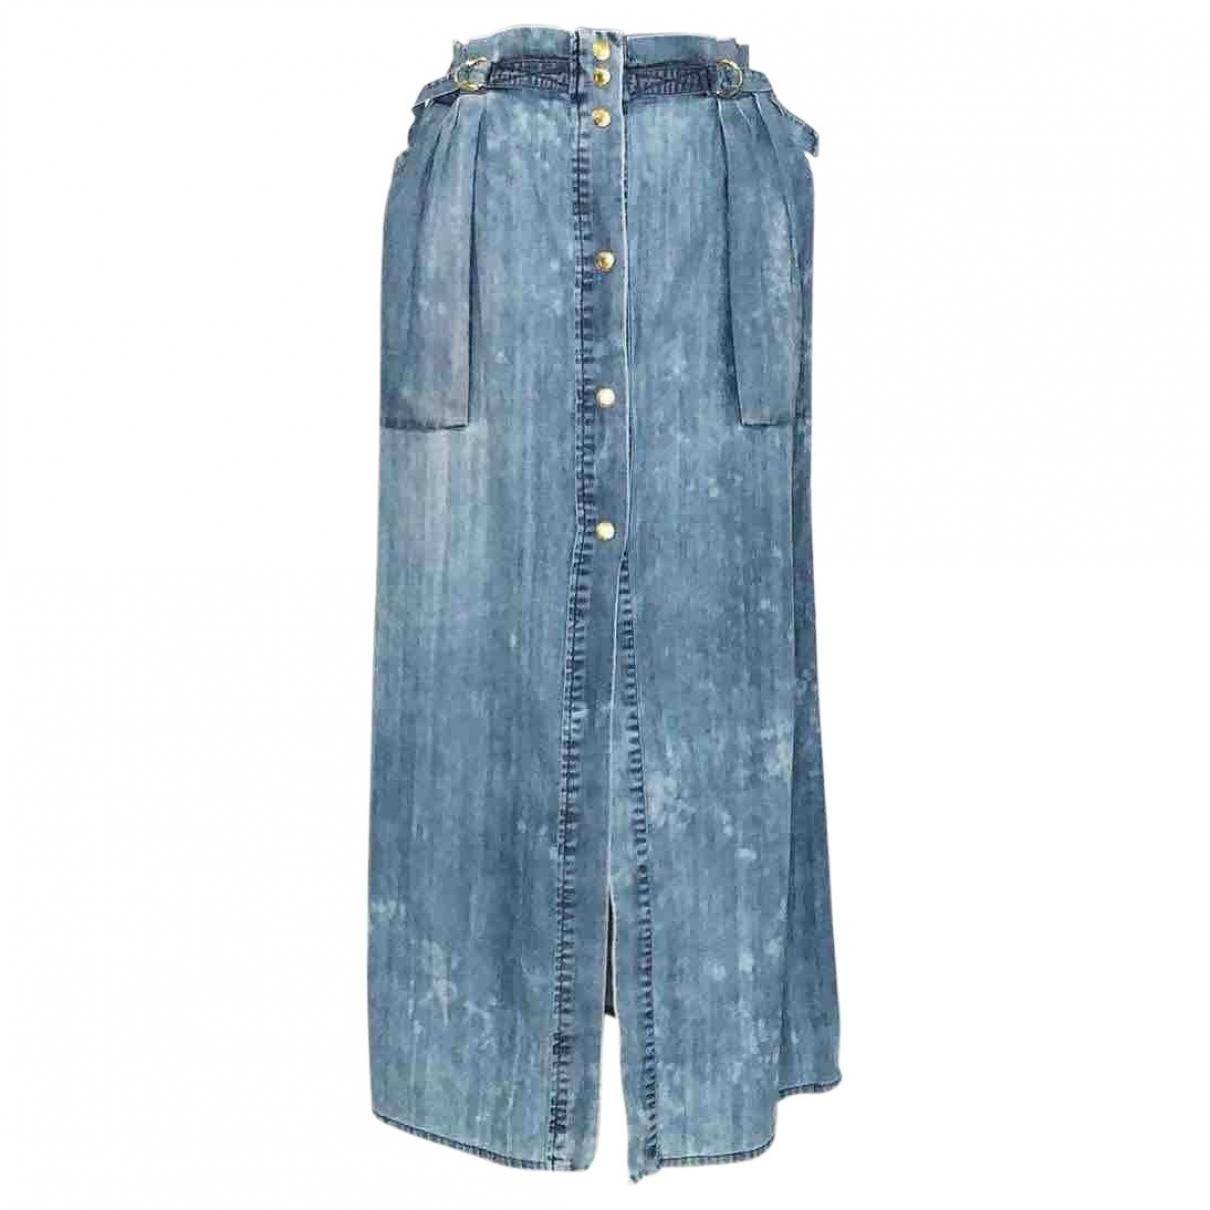 Pierre Balmain \N Blue Cotton skirt for Women 40 IT